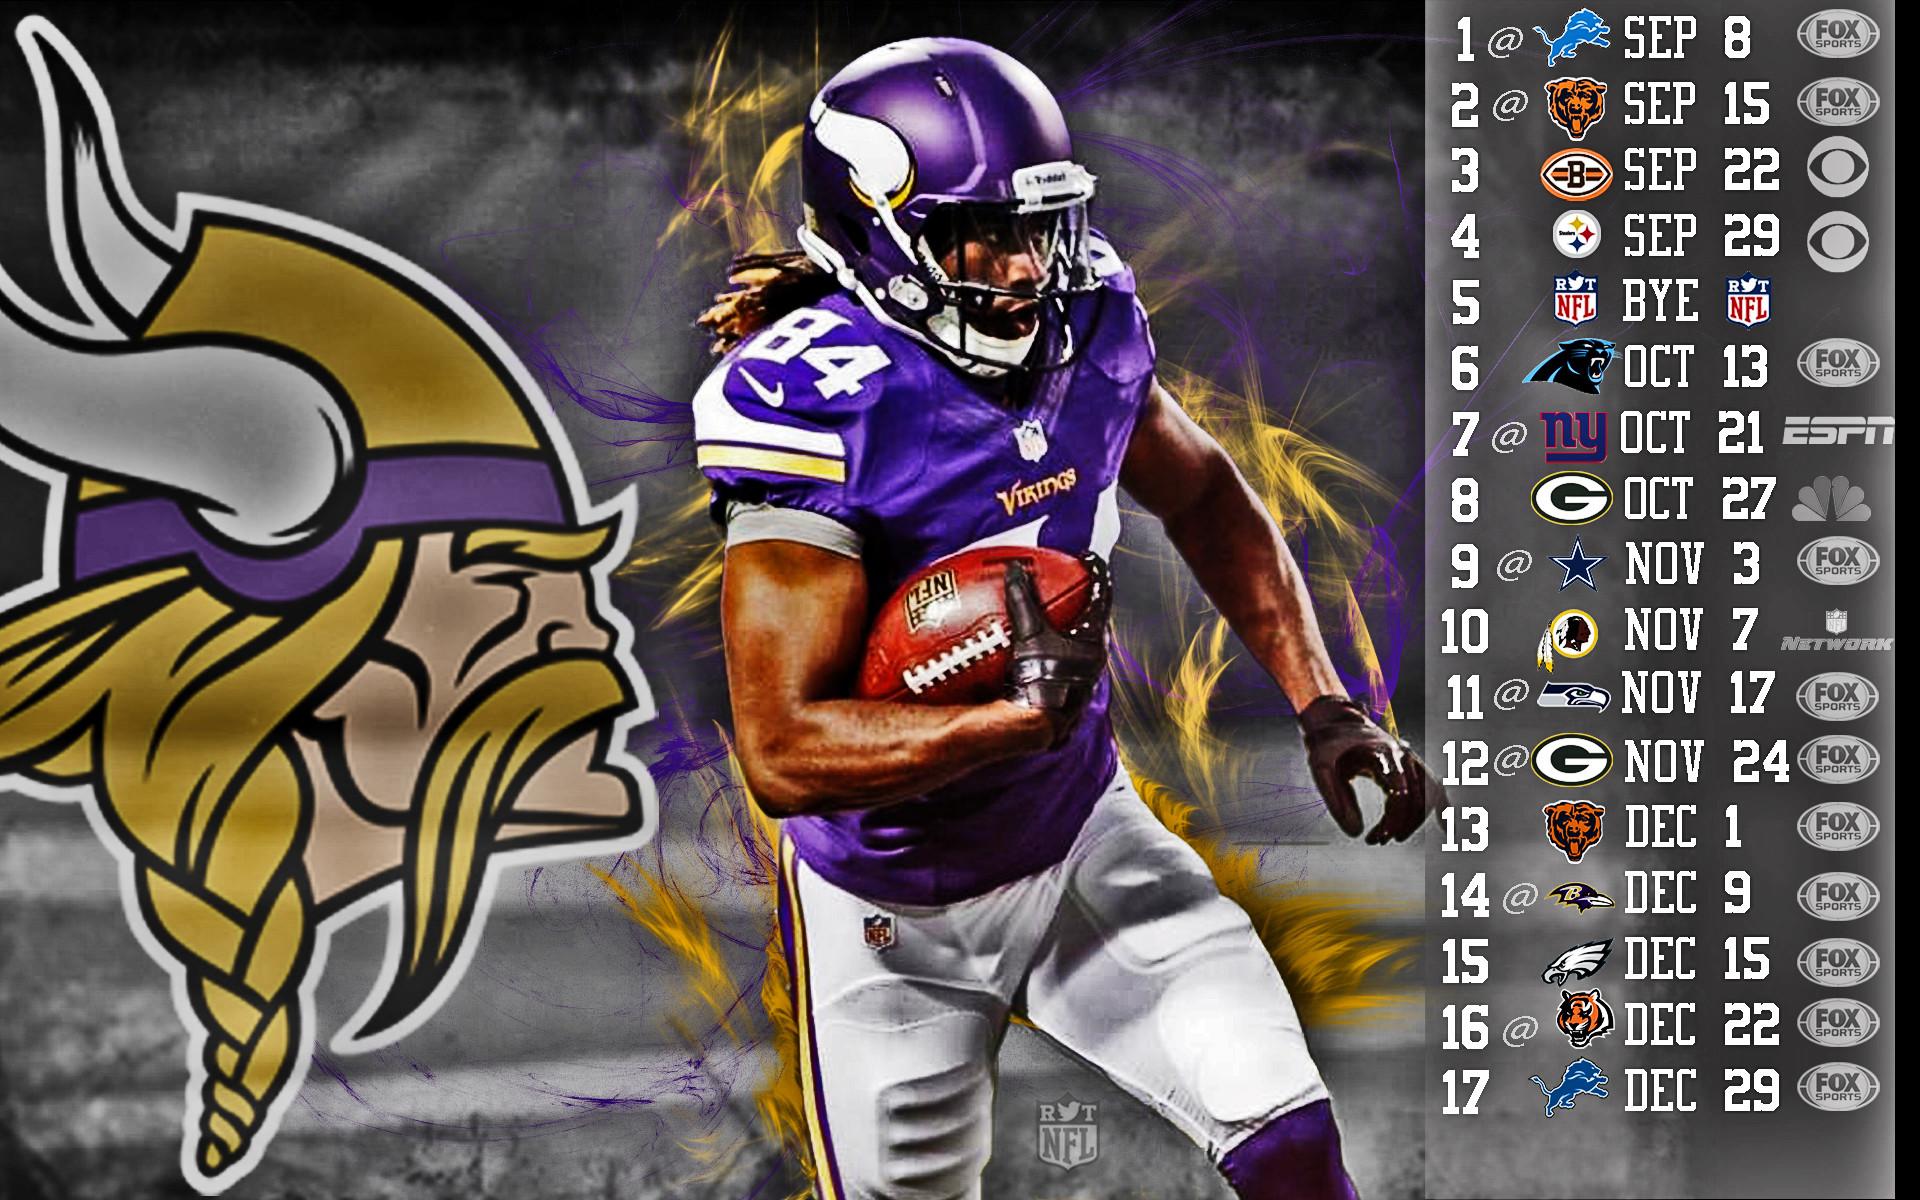 Vikings Cordarelle Patterson 2013 Schedule HDR